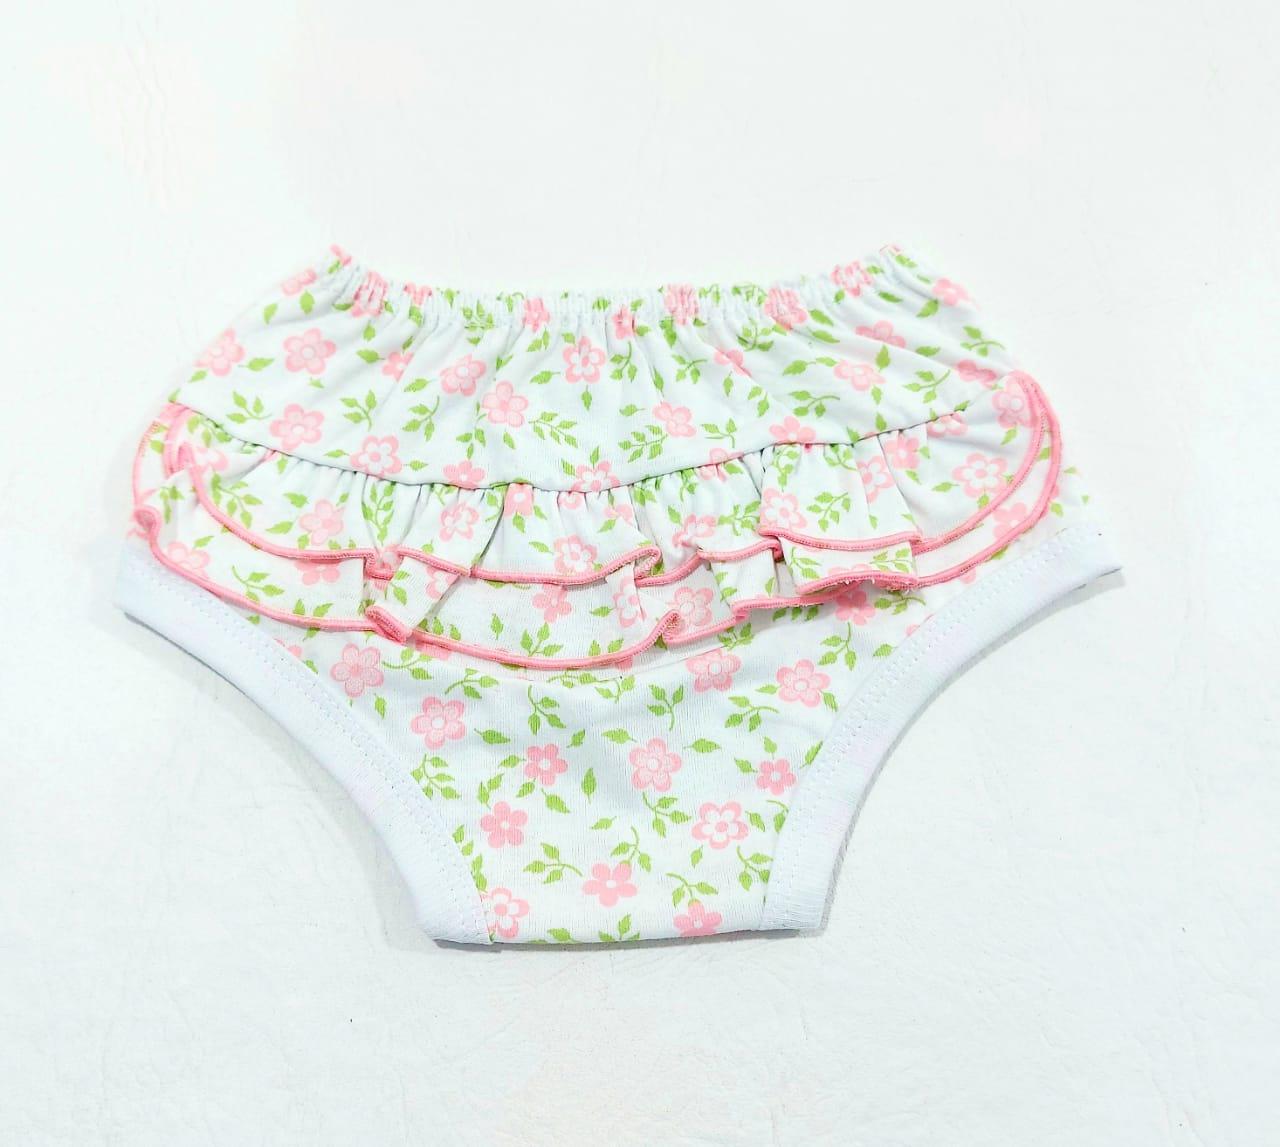 Conjunto Floral - Body Regata e Tapa Fralda C/ Tiara - 100% Algodão - Baby amore